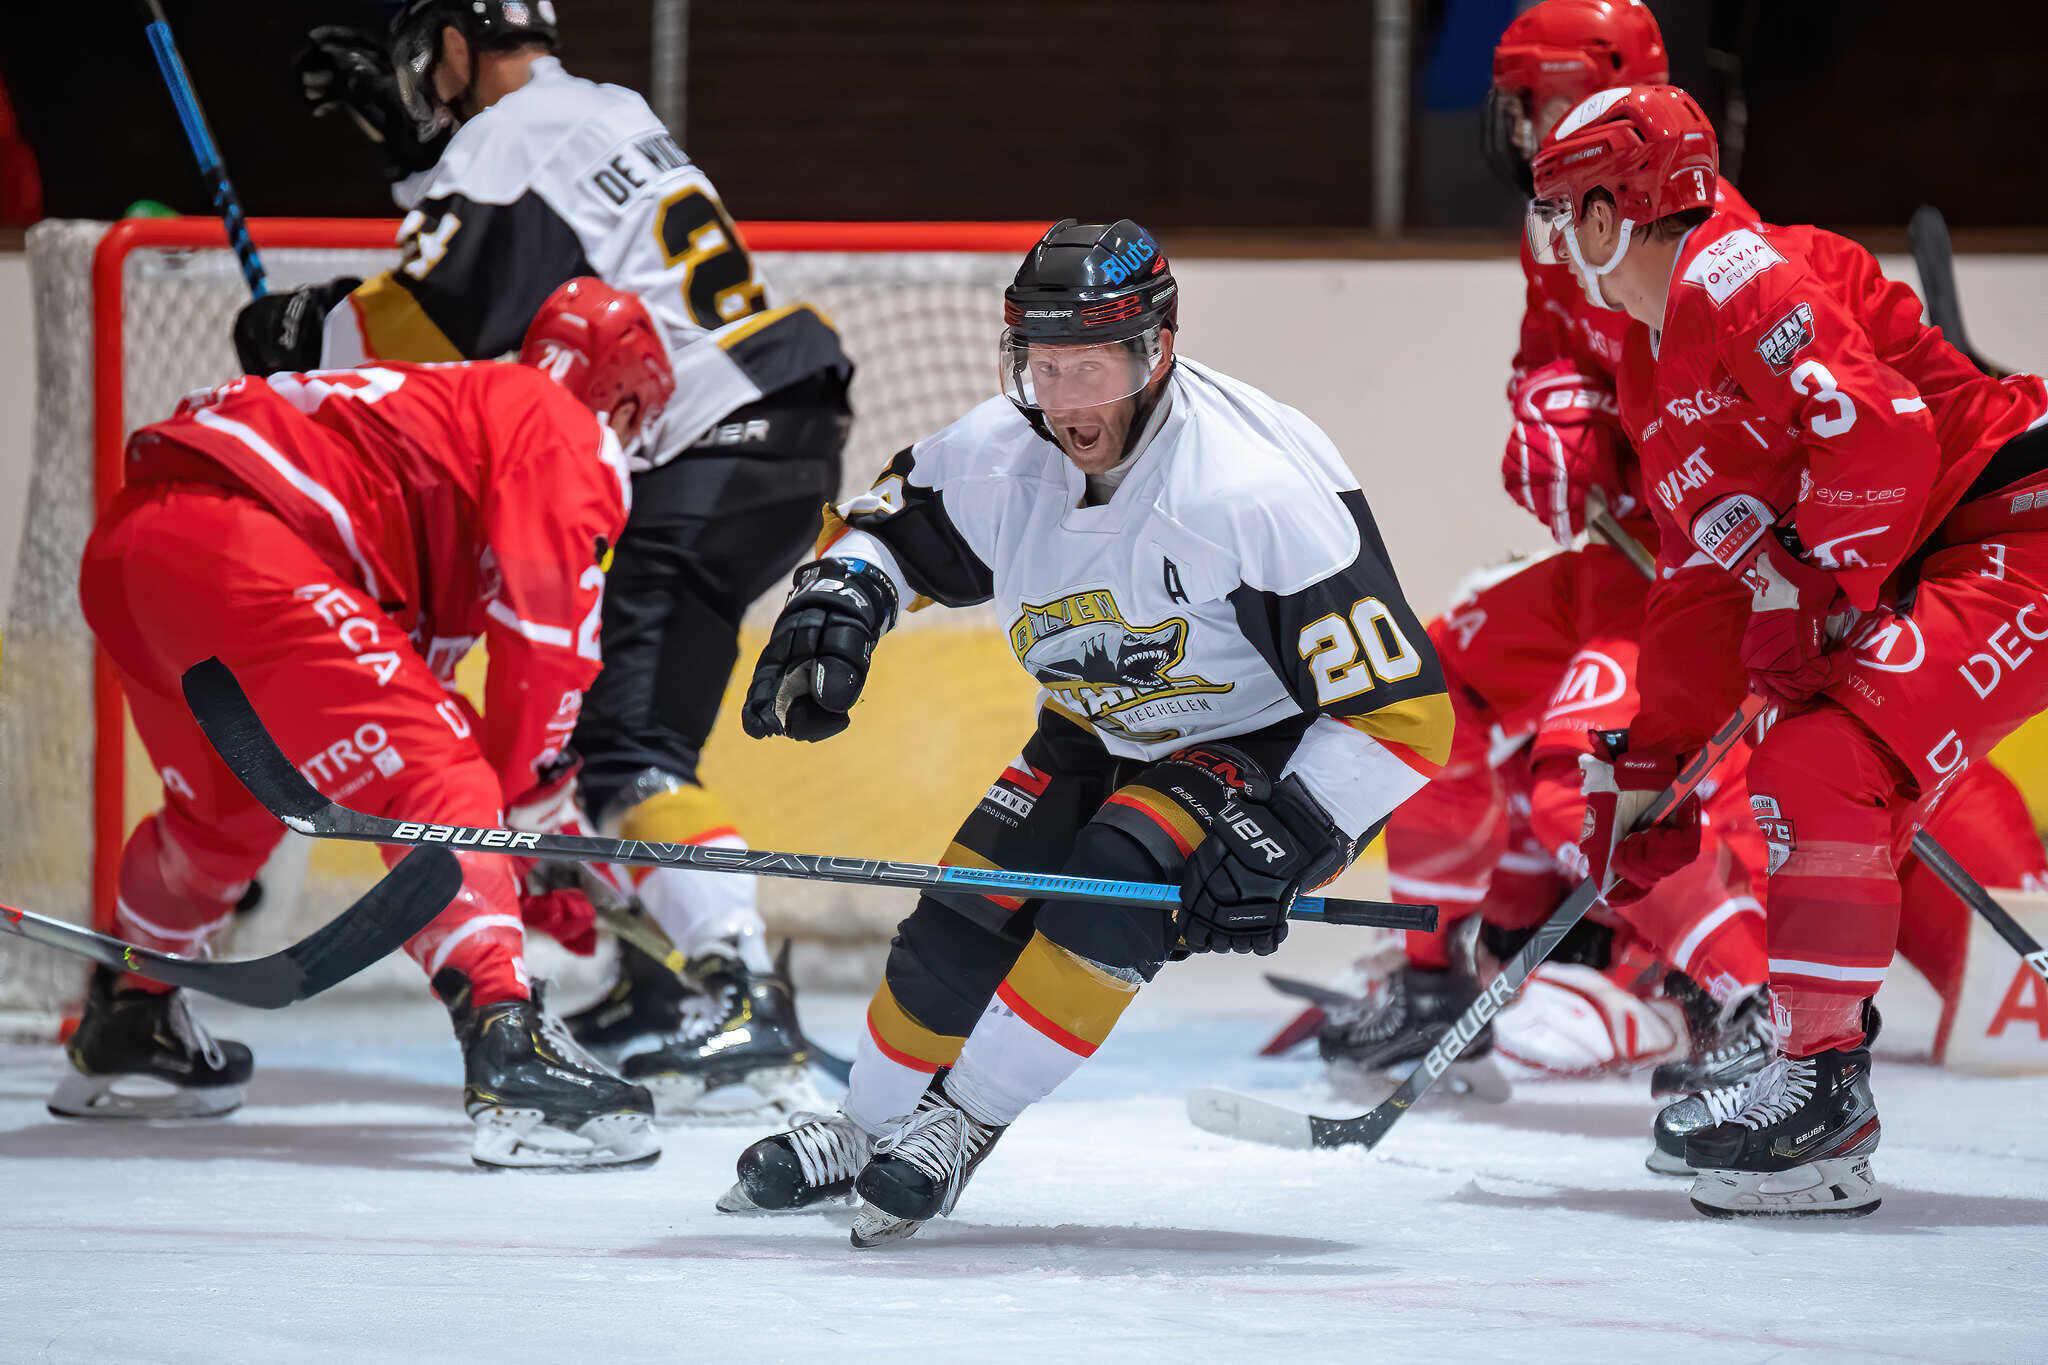 Heylen Vastgoed HYC vs Mechelen Golden Sharks